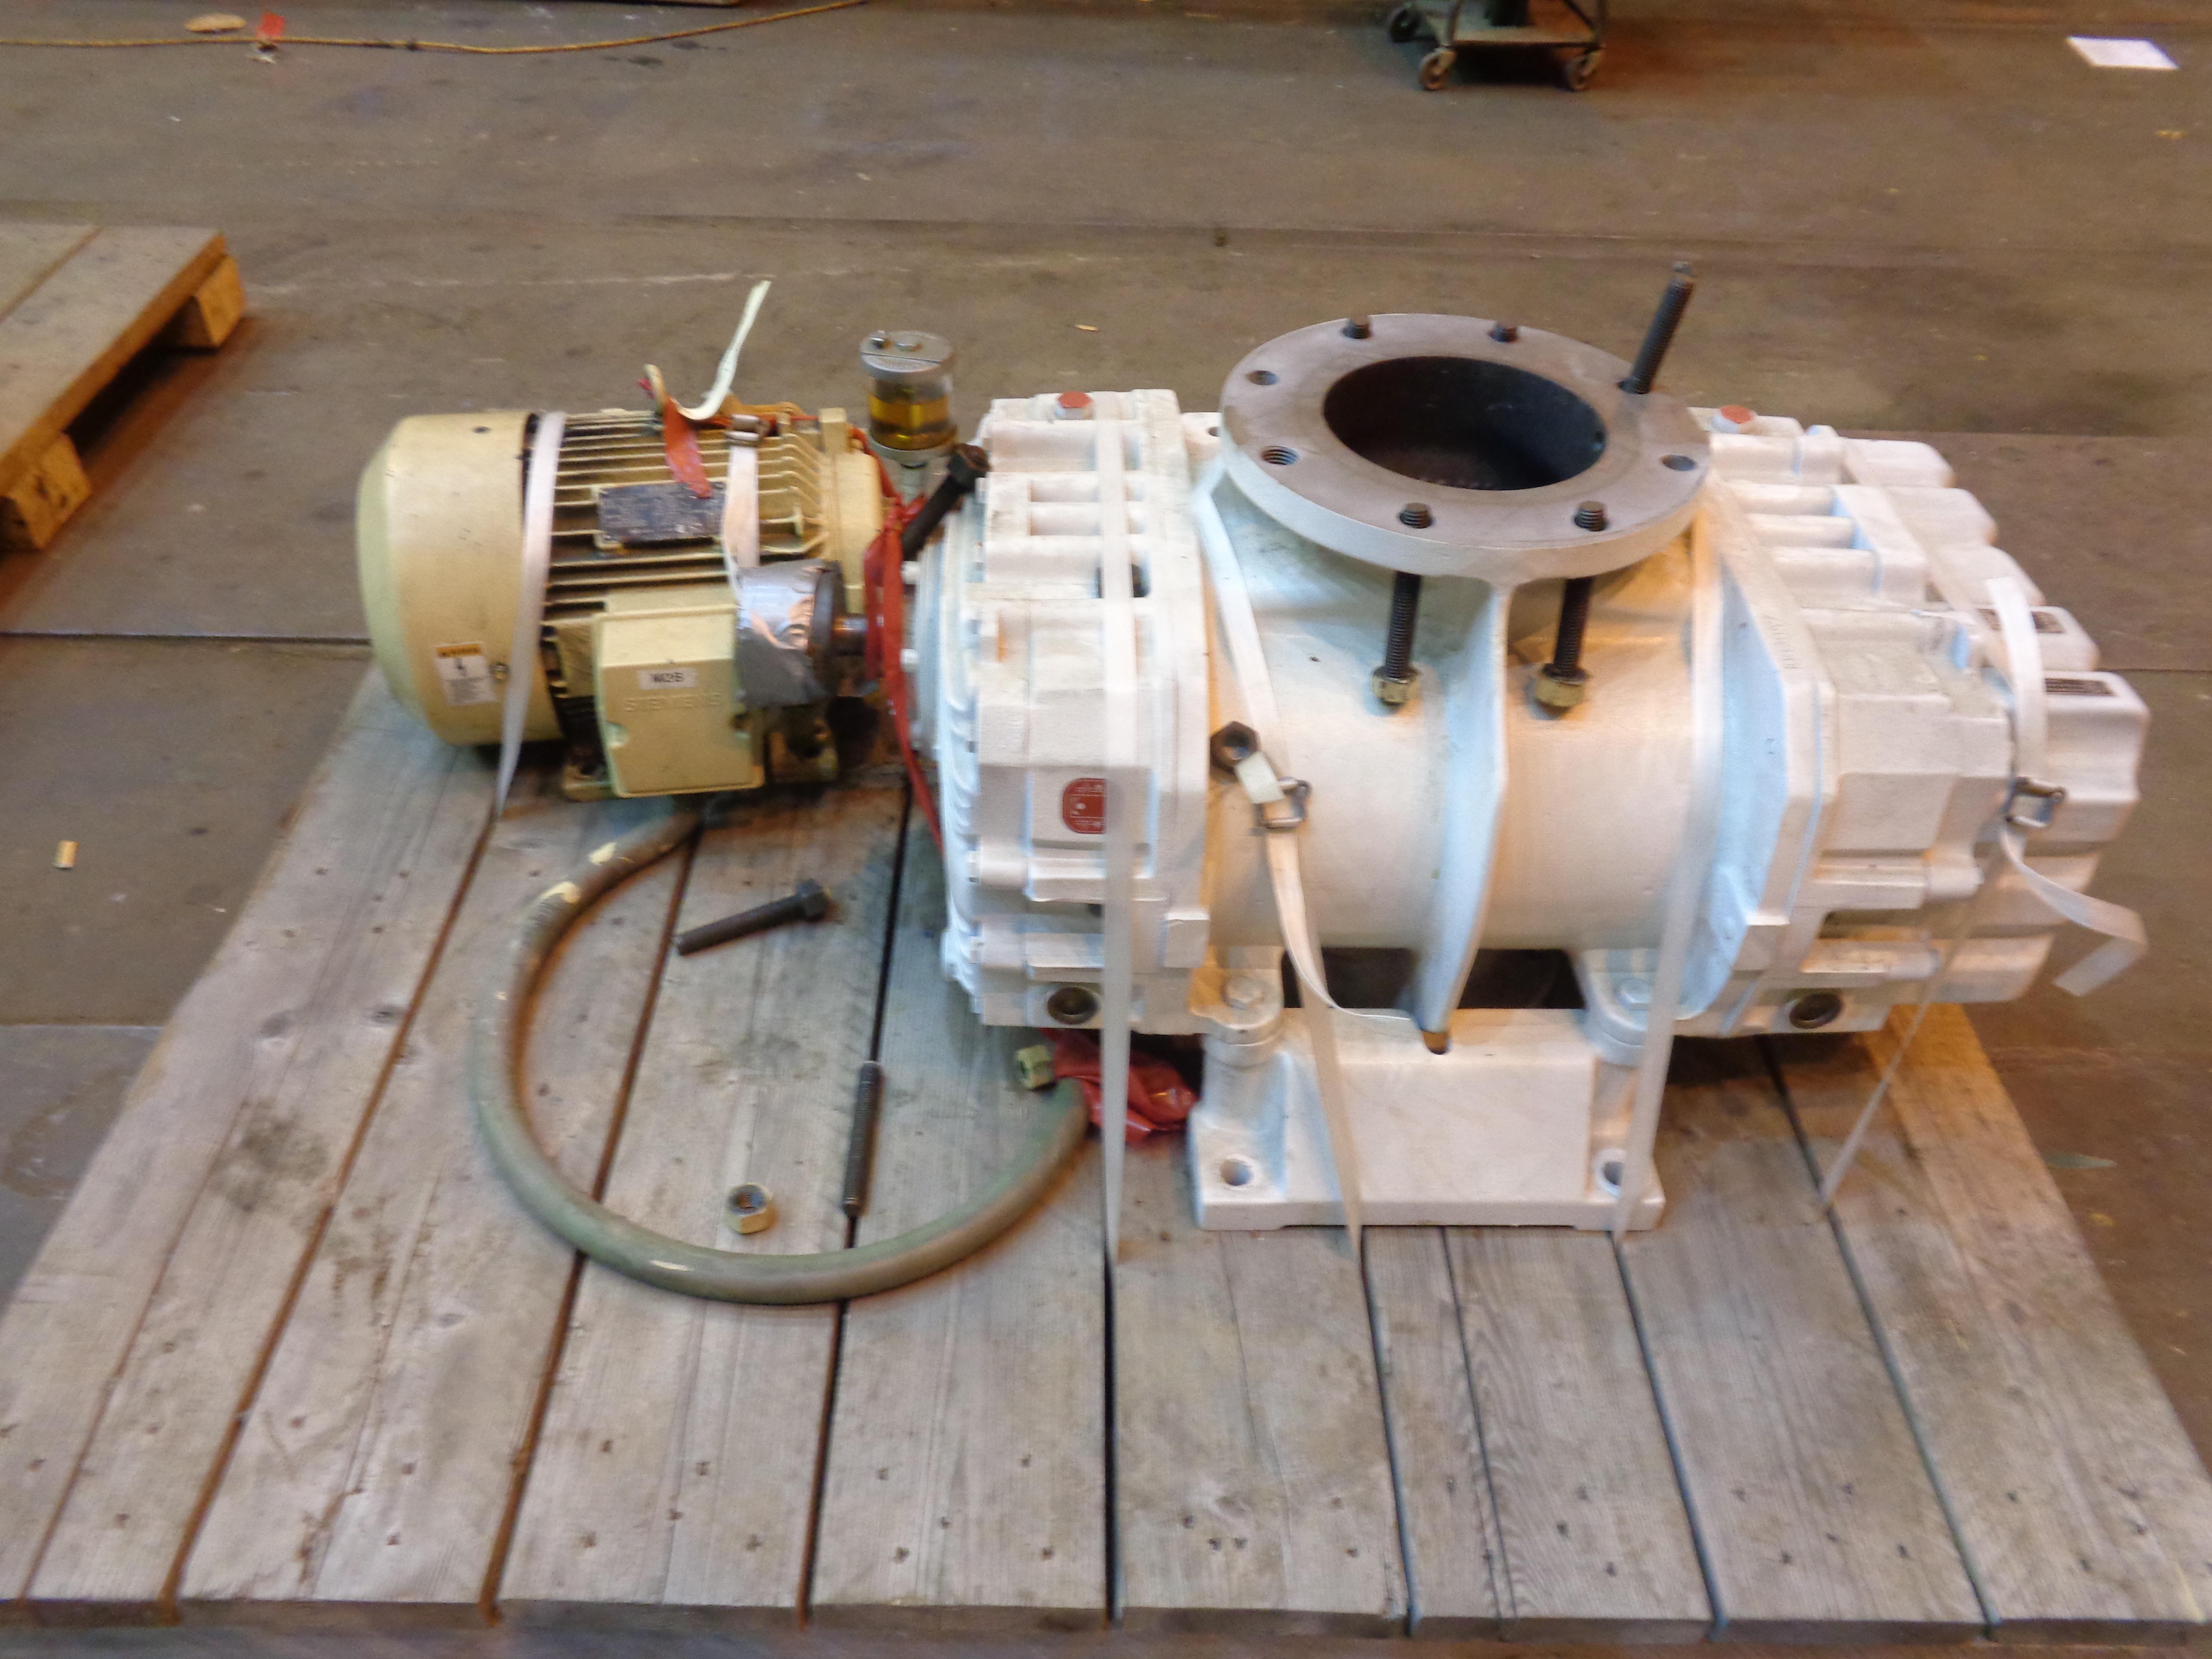 Lot of 3 Vacuum Pumps - Image 4 of 26